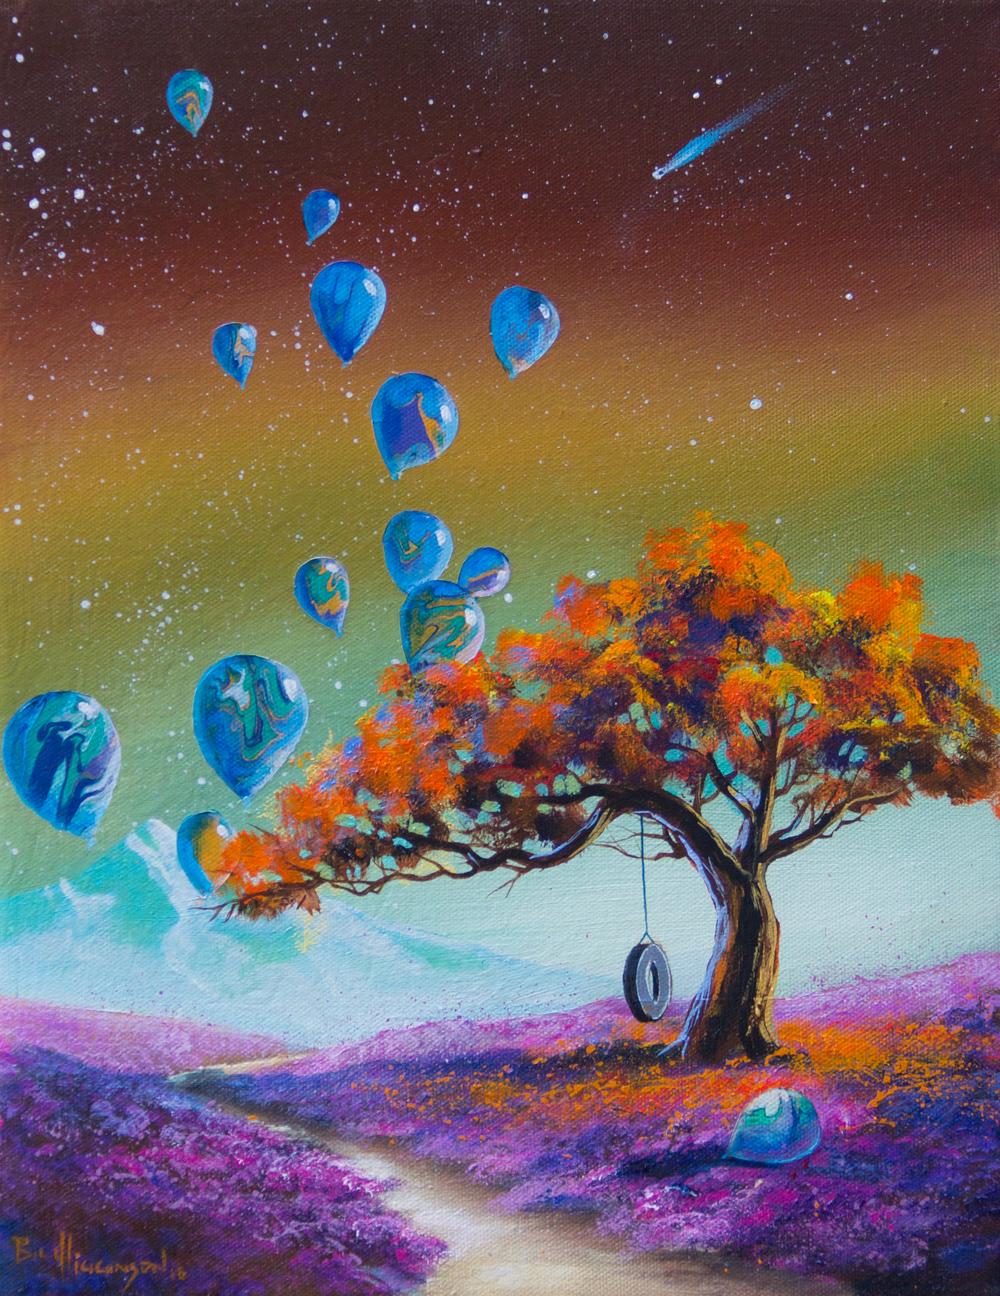 bill-higginson/art/blue-balloons/fantasy-landscape-surrealism